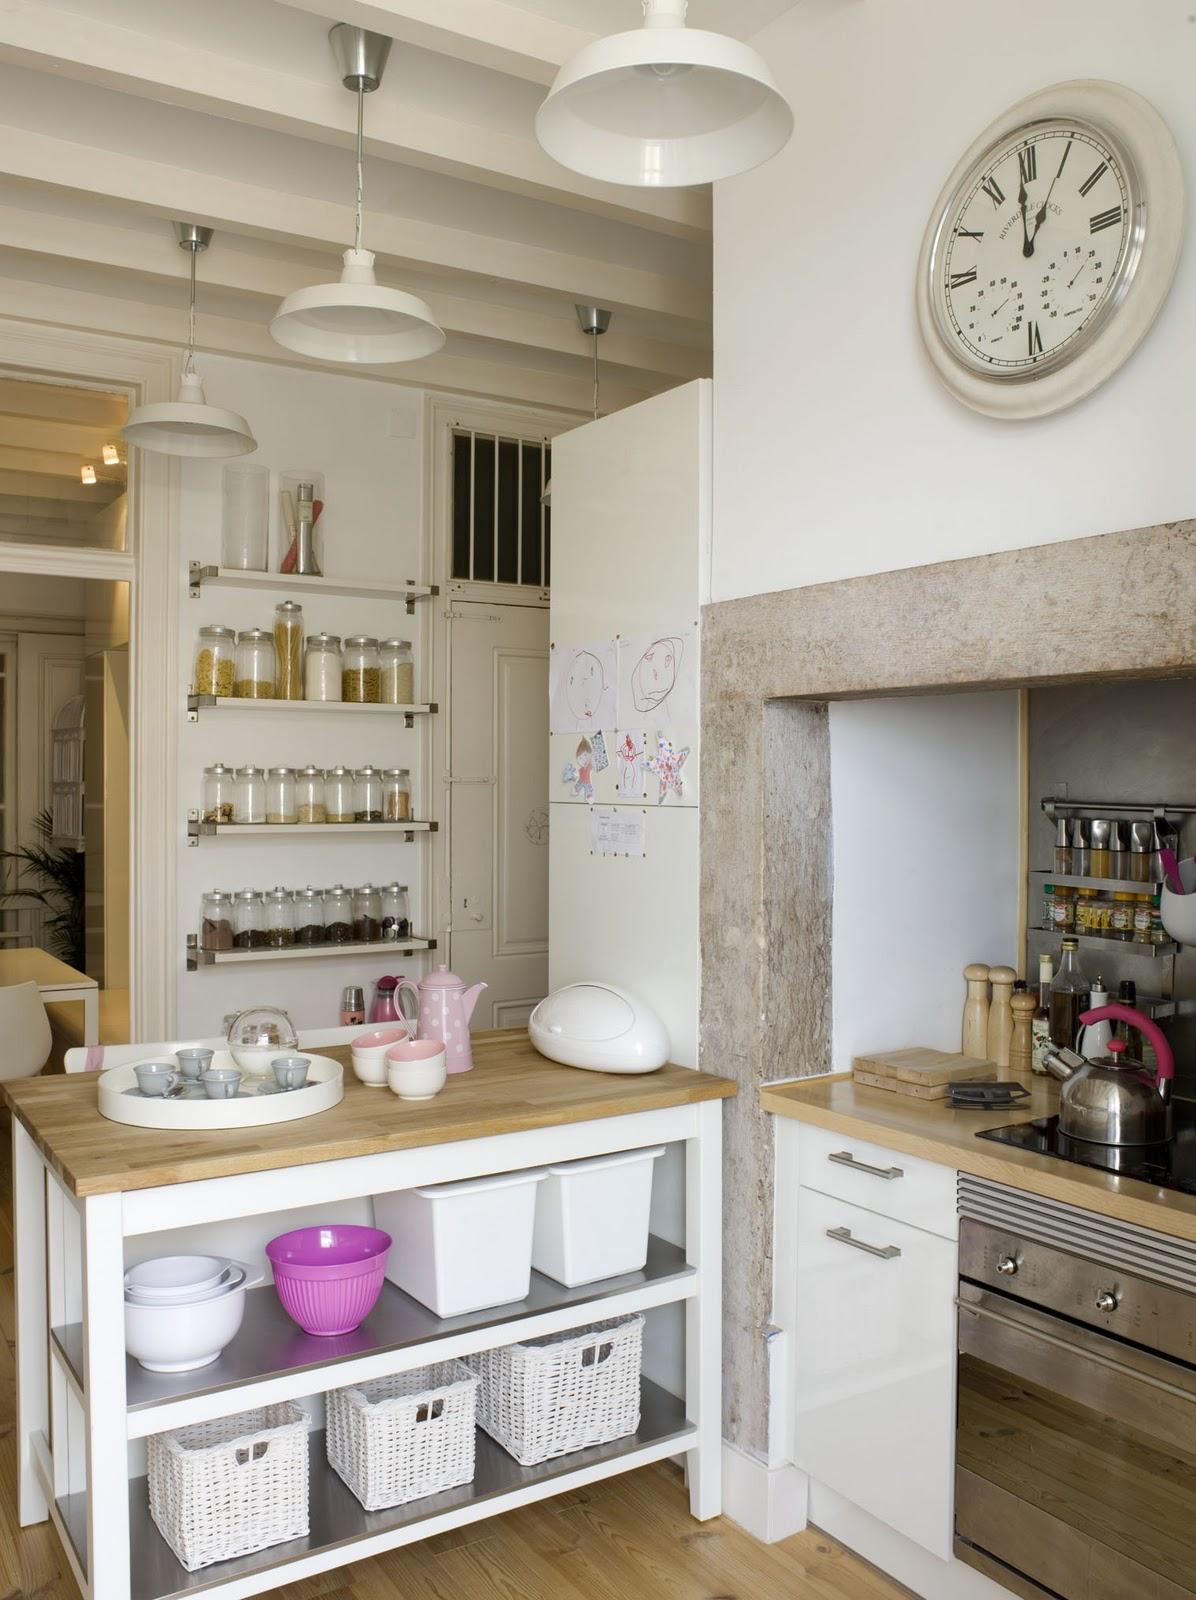 Home Styling Ana Antunes Ikea In My House O Ikea Em Minha Casa